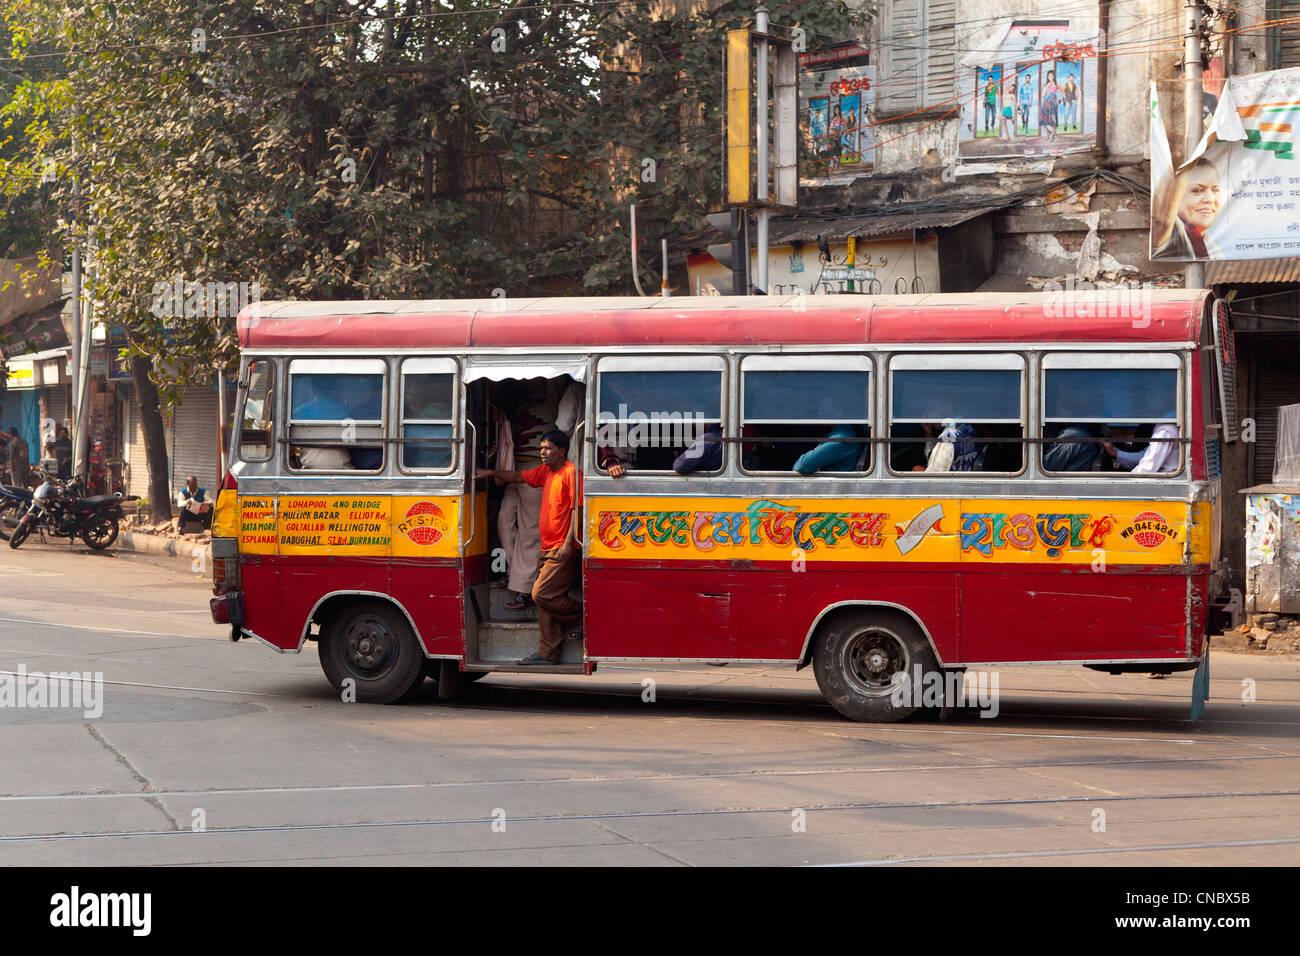 india west bengal kolkata calcutta municipal bus stock photo royalty free image 47590519. Black Bedroom Furniture Sets. Home Design Ideas